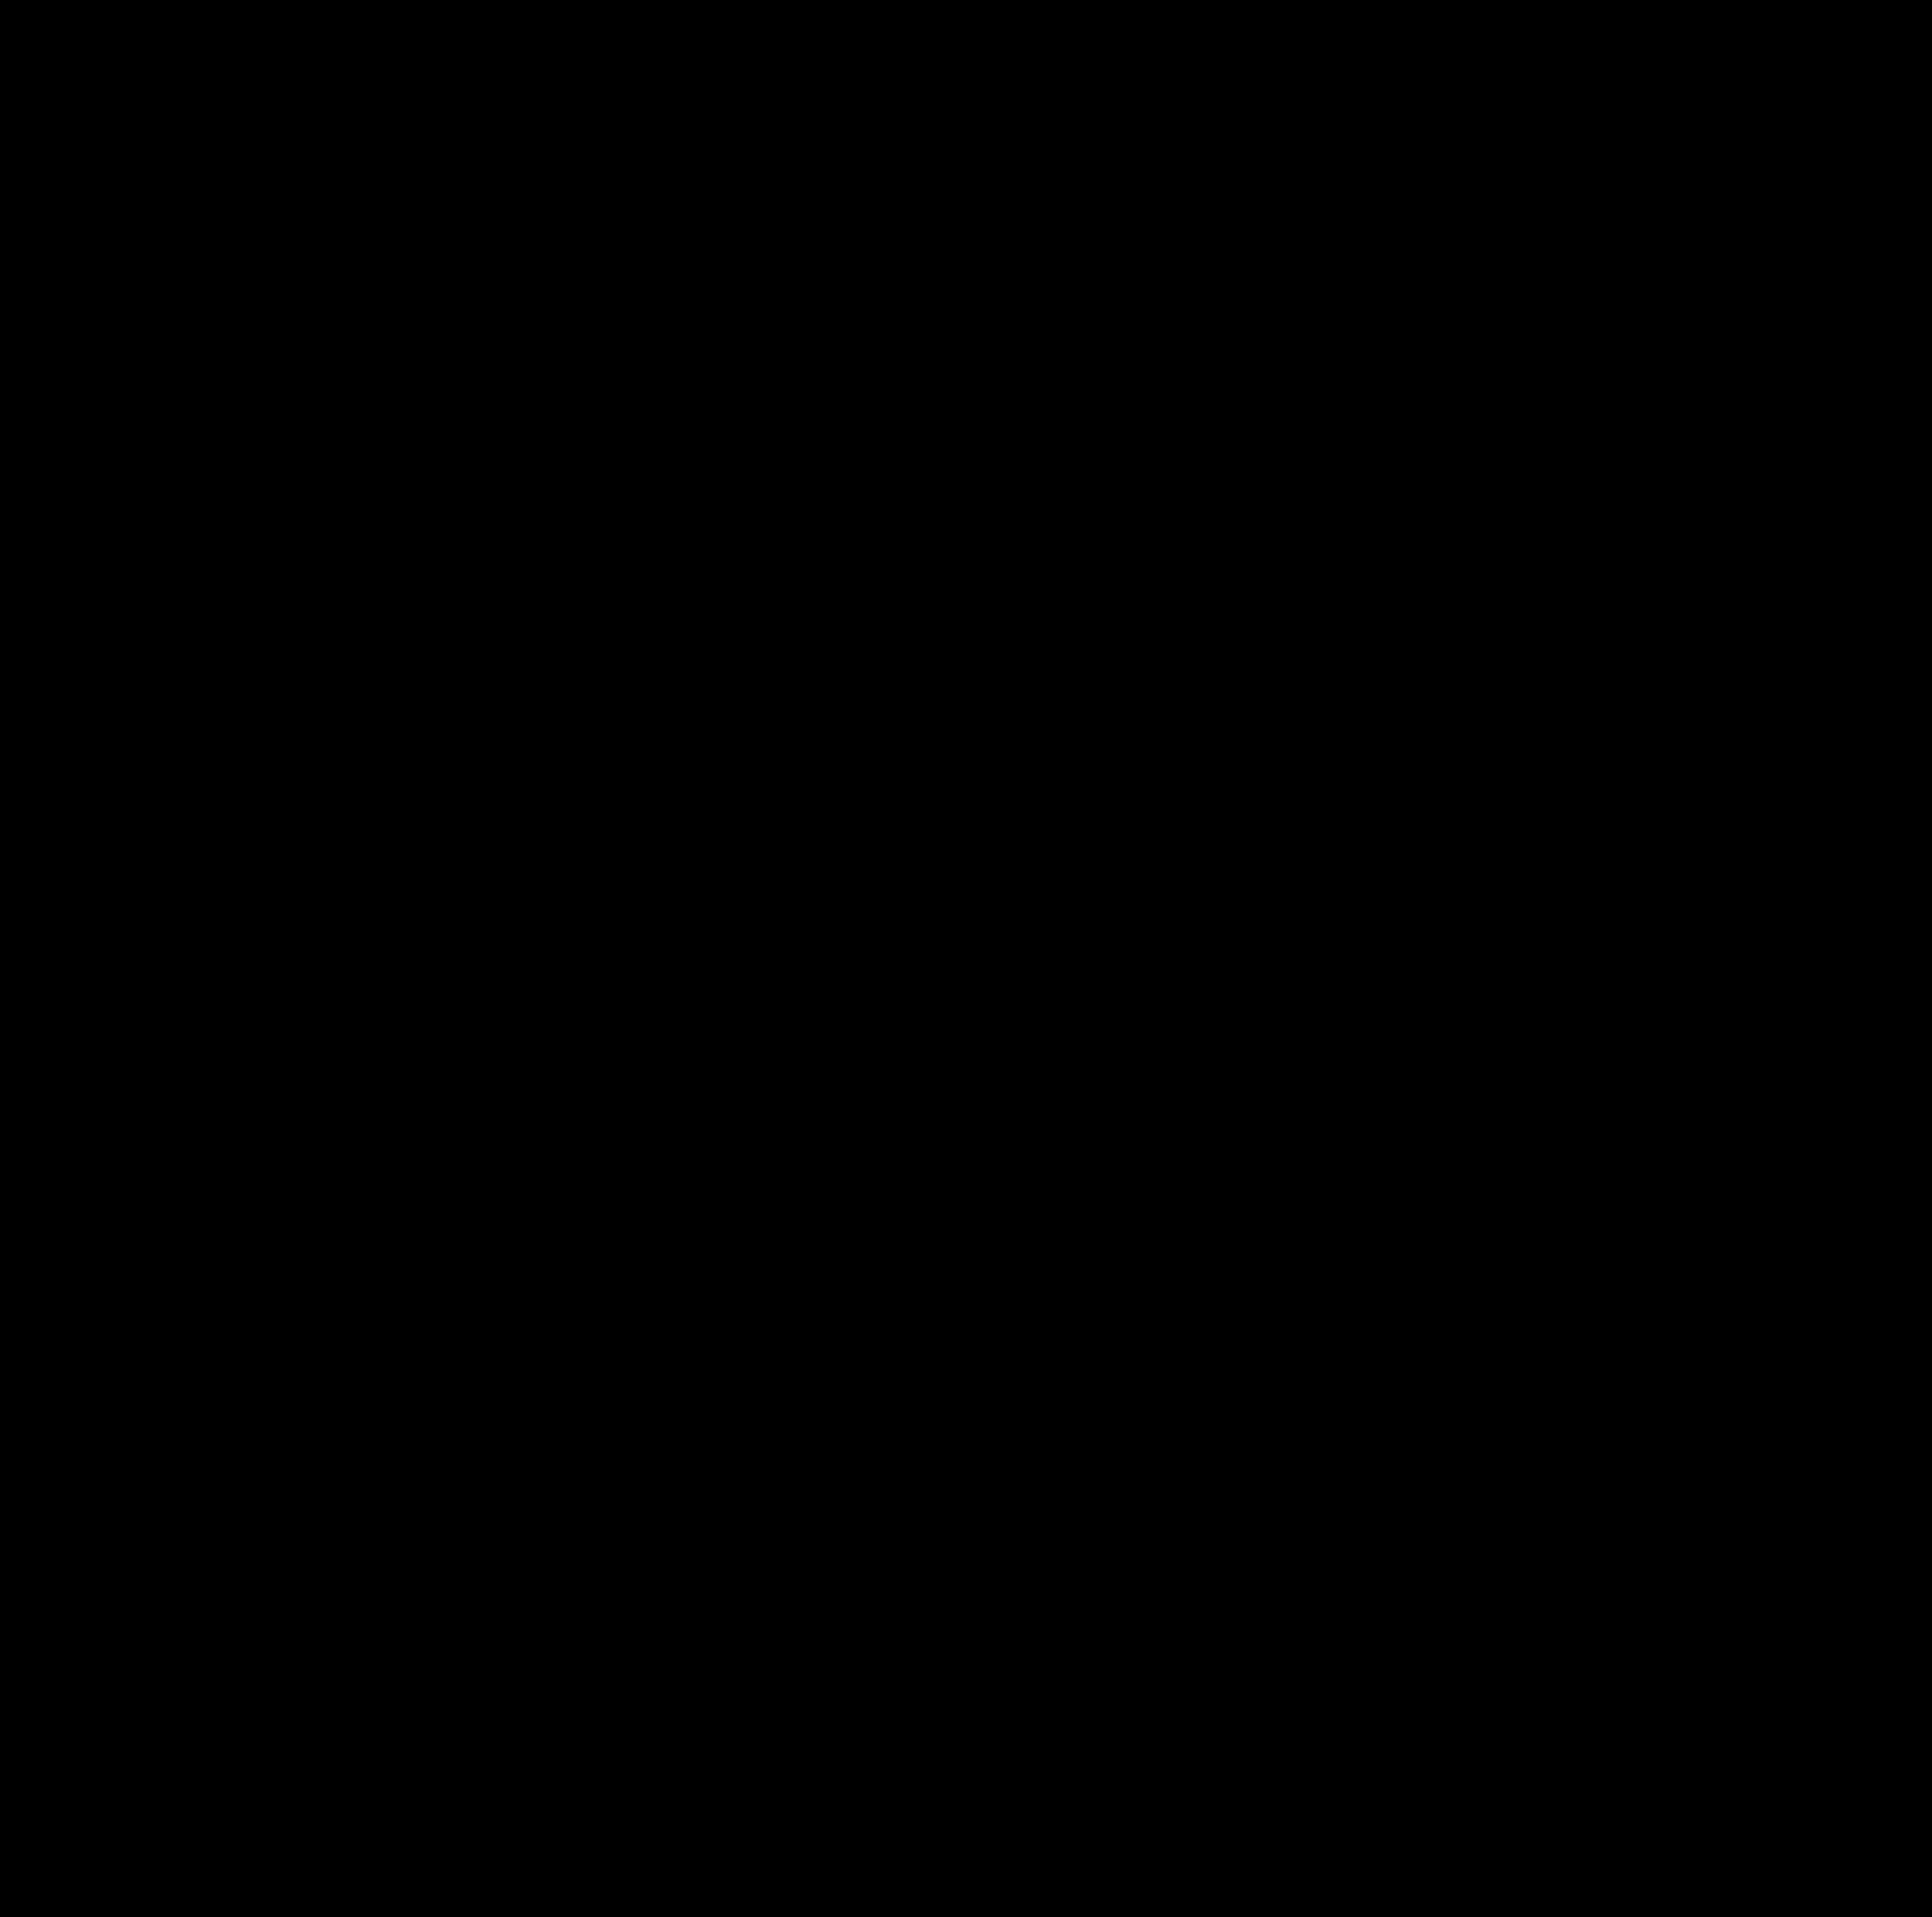 2334x2316 Clipart